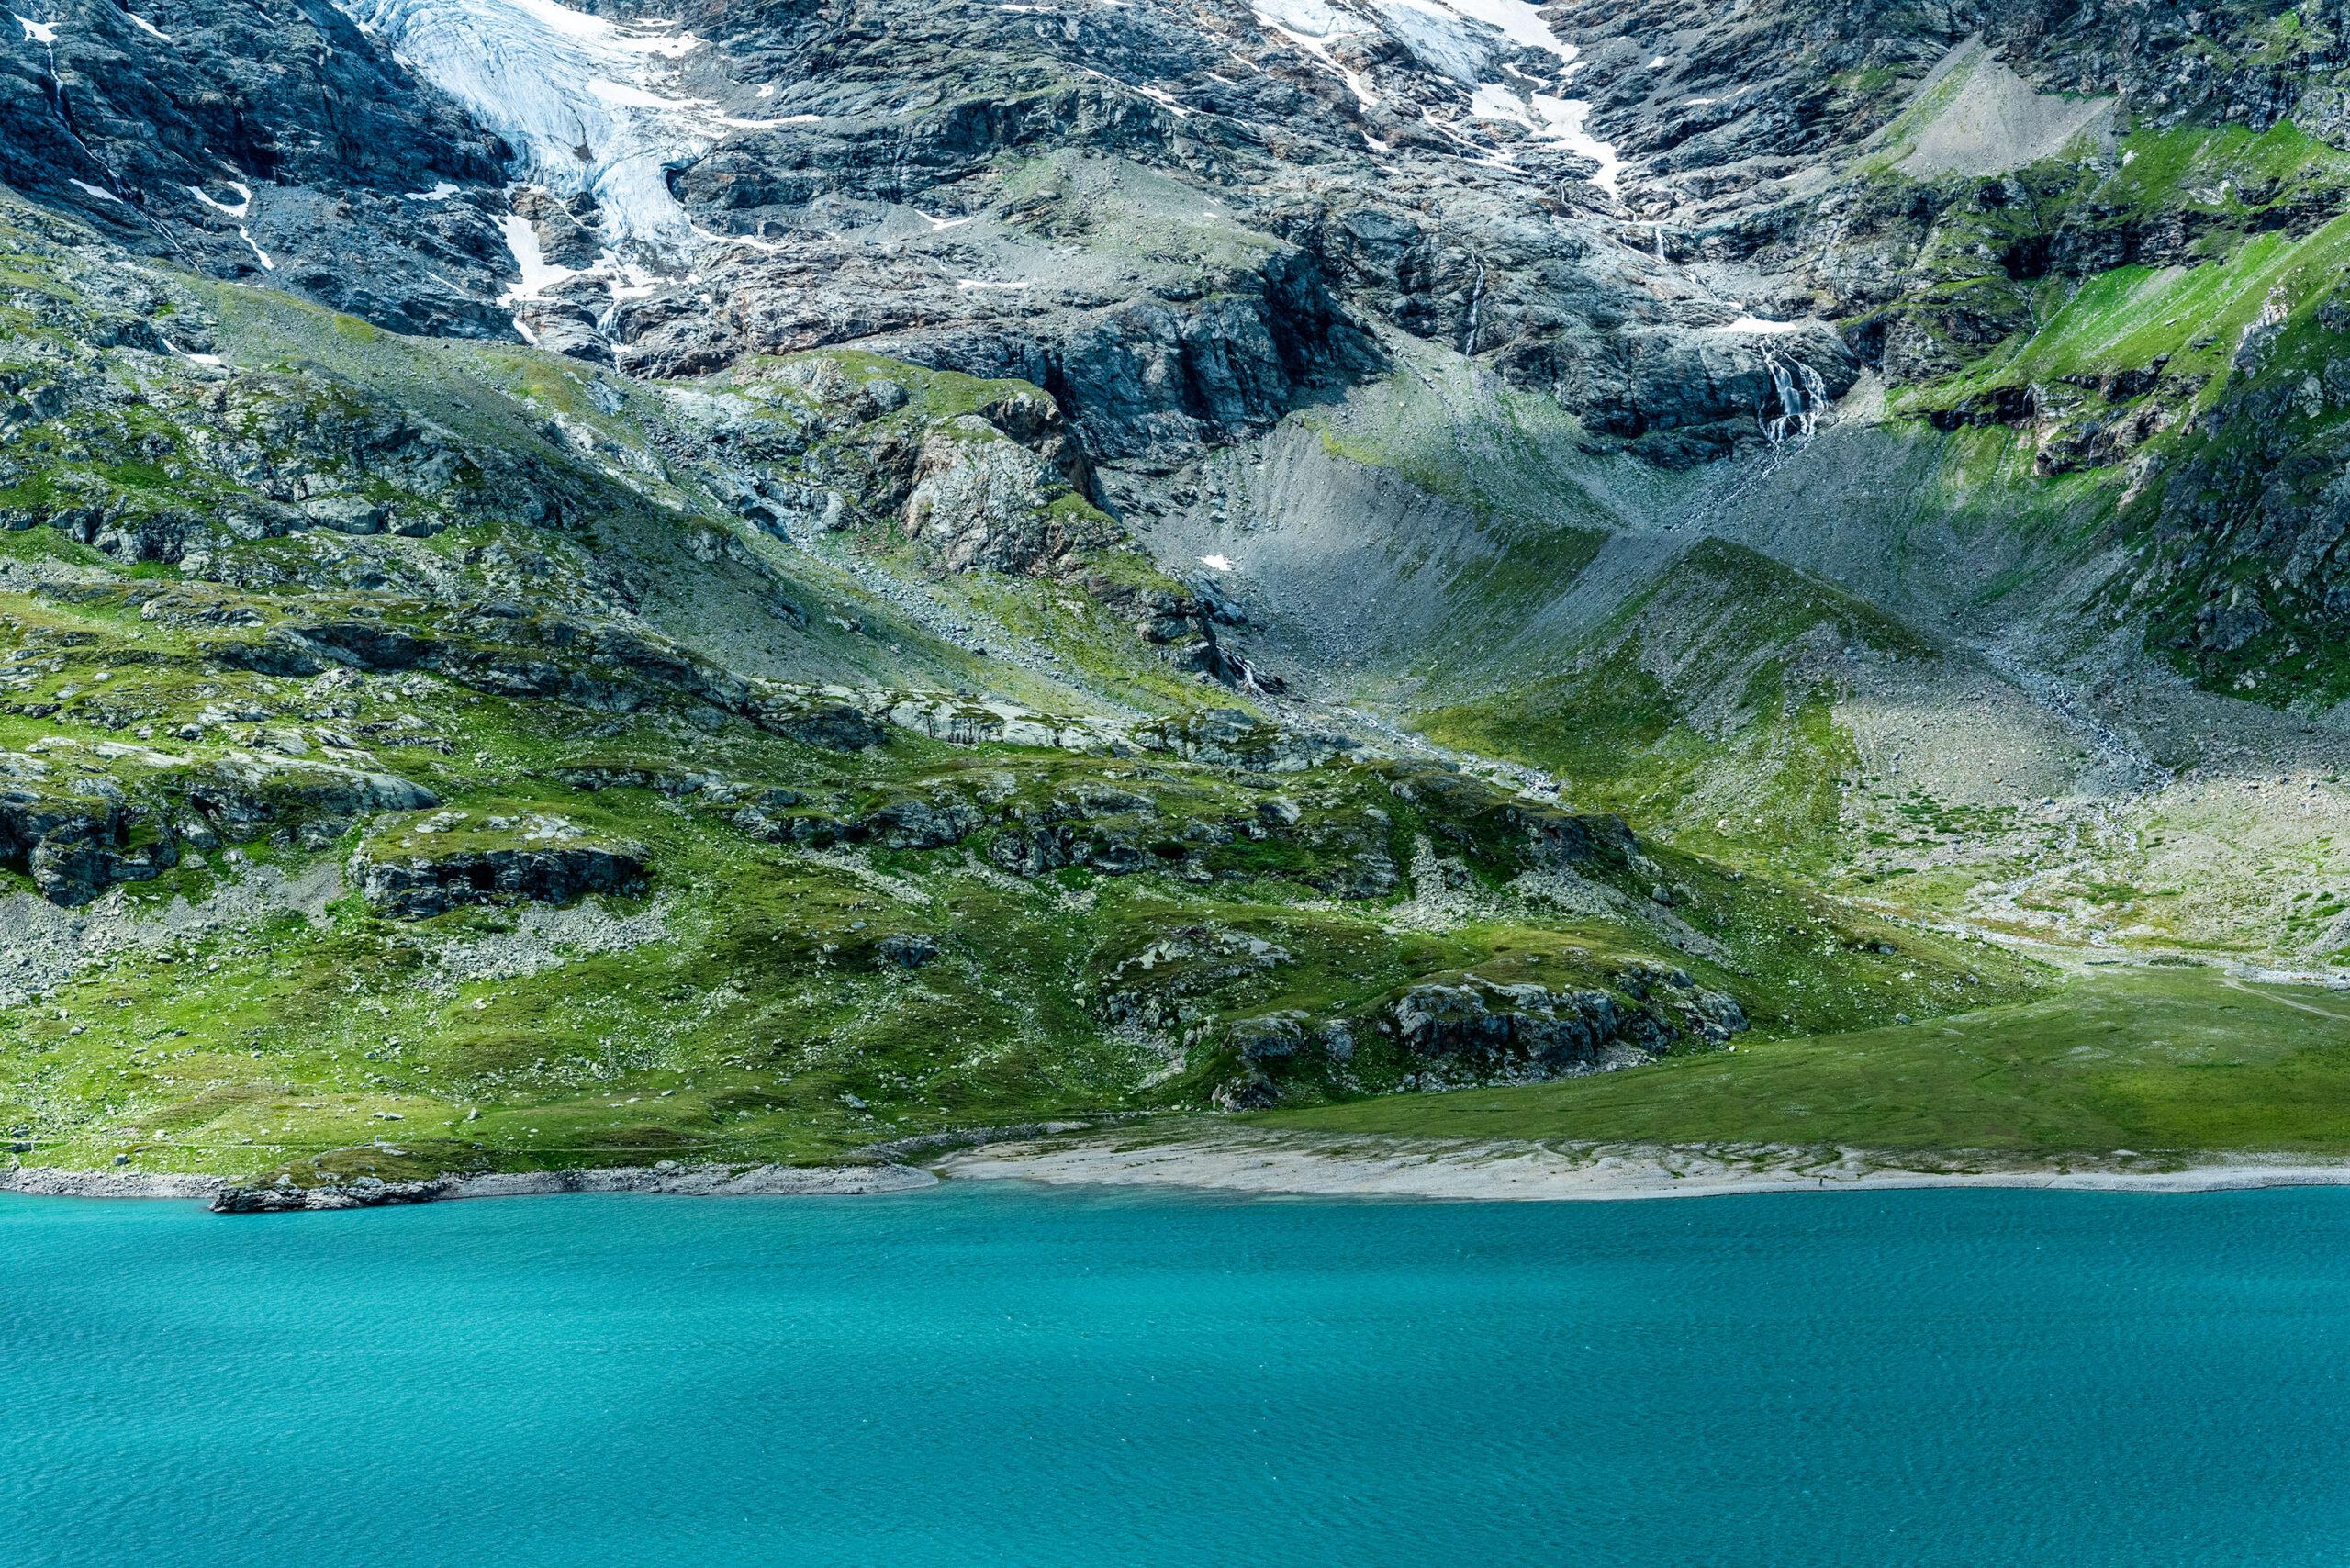 Close-up photograph of the Lago Bianco in Graubünden, Switzerland.